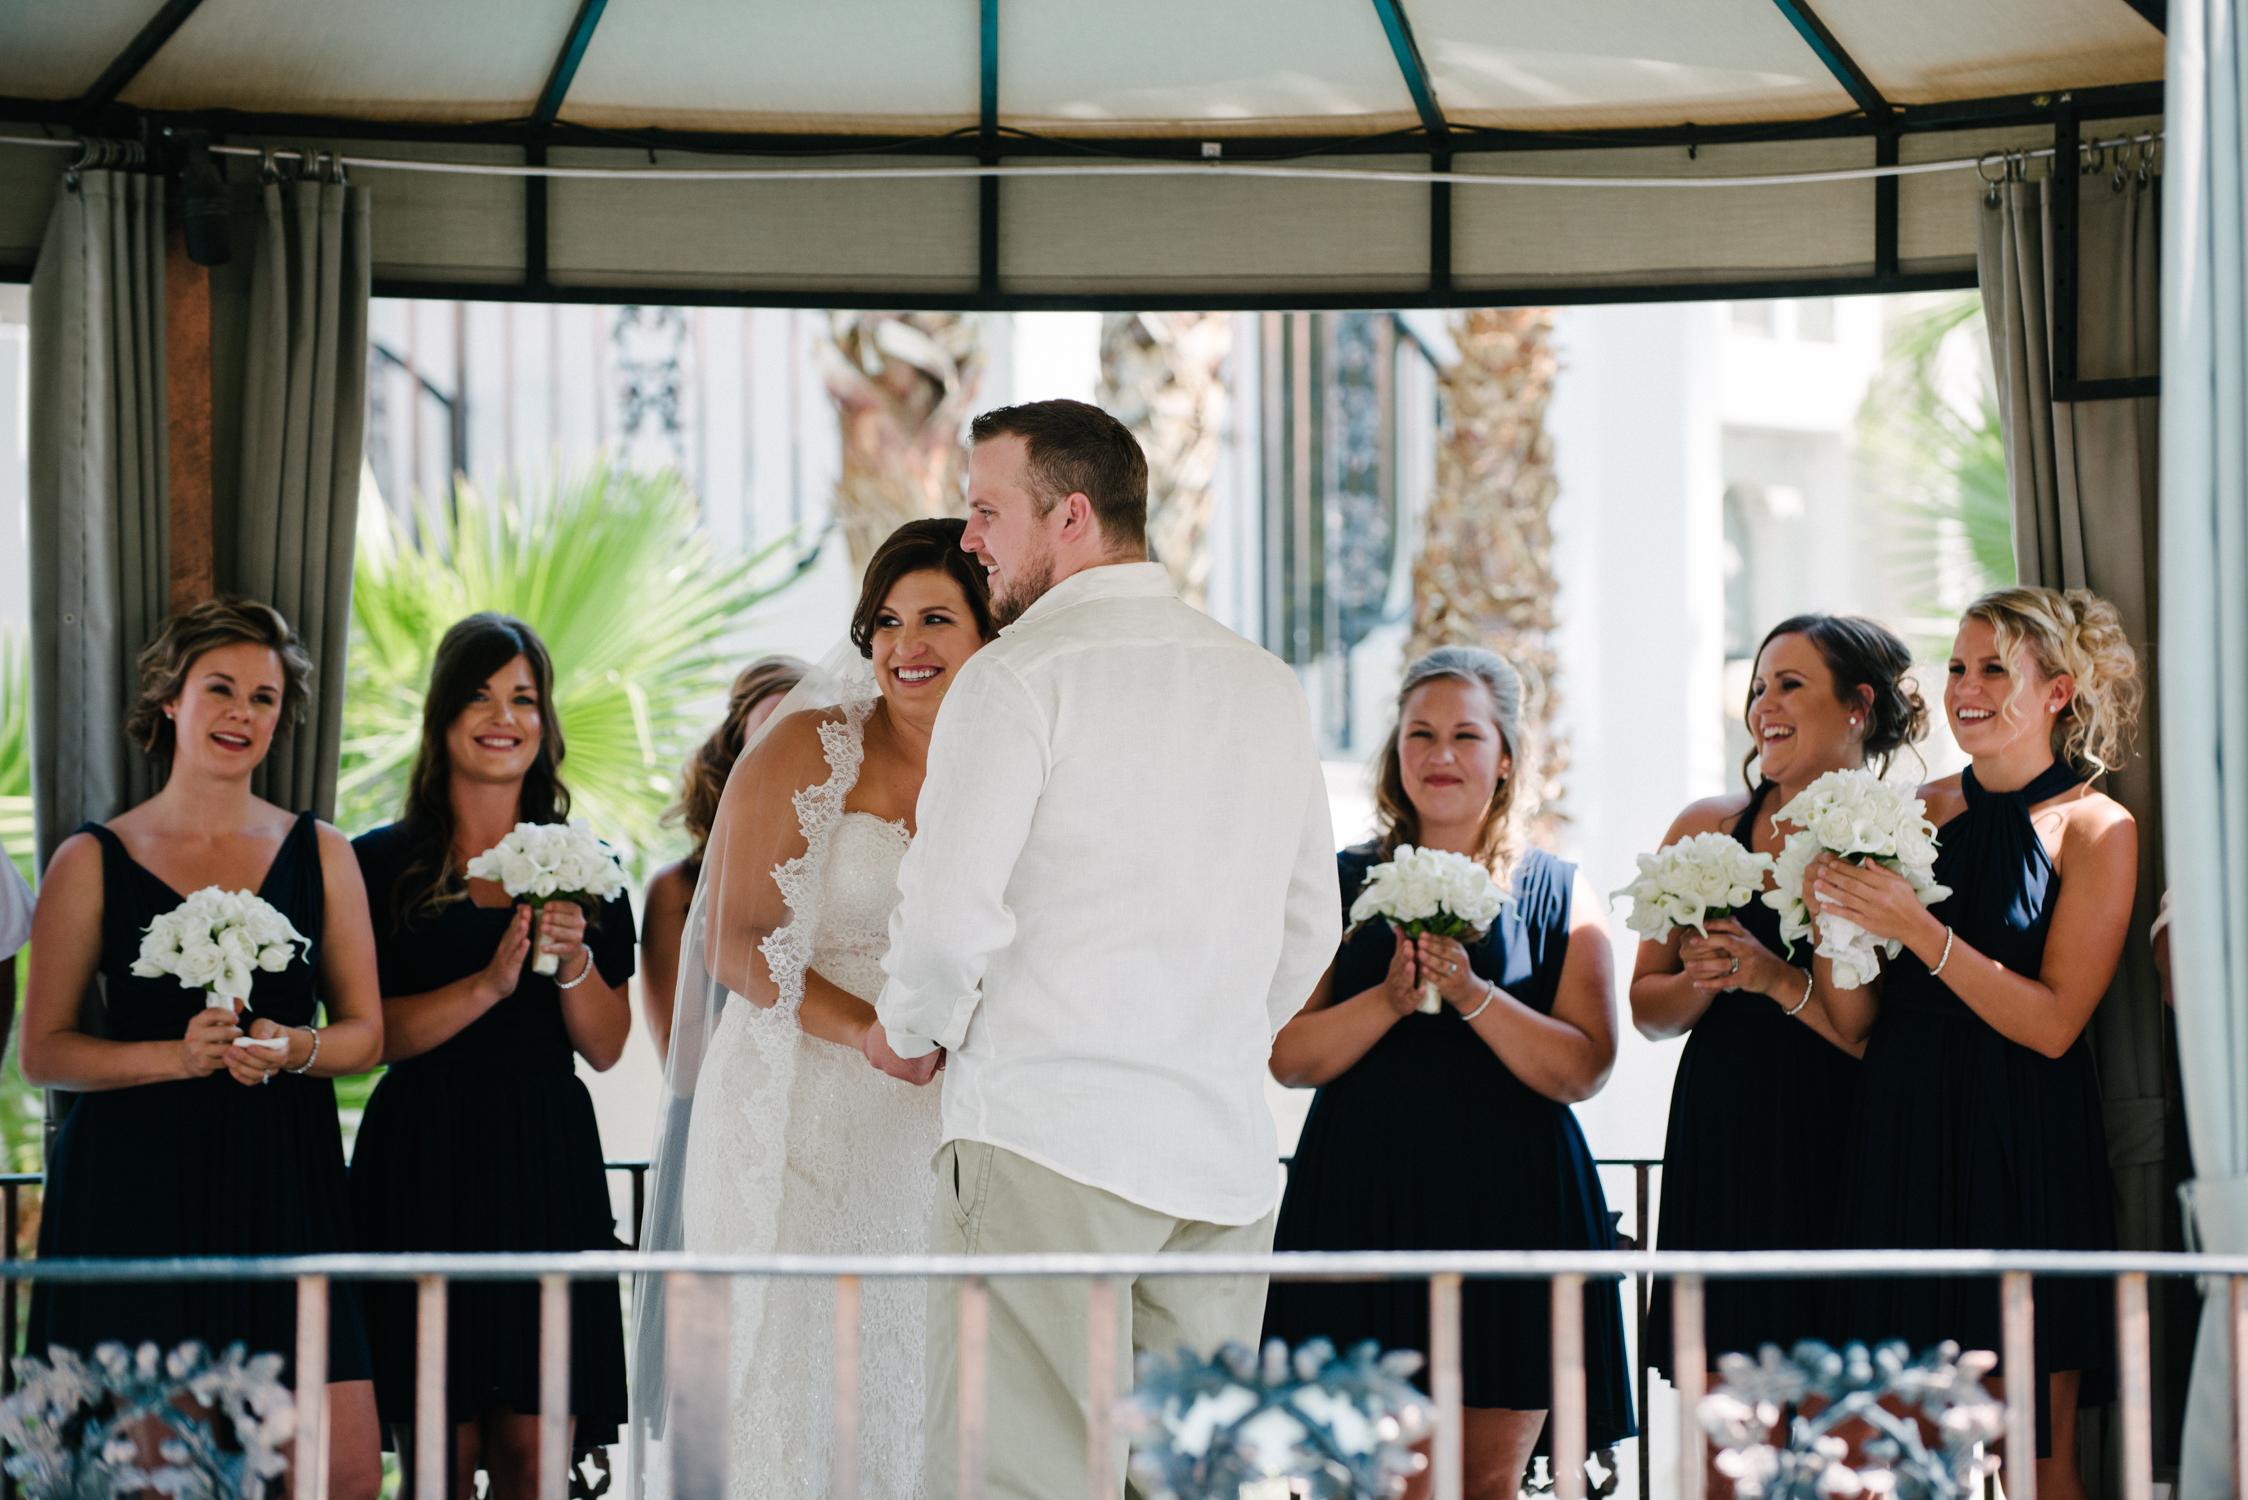 018_Redrock_canyon_vegas_wedding_photographer.jpg